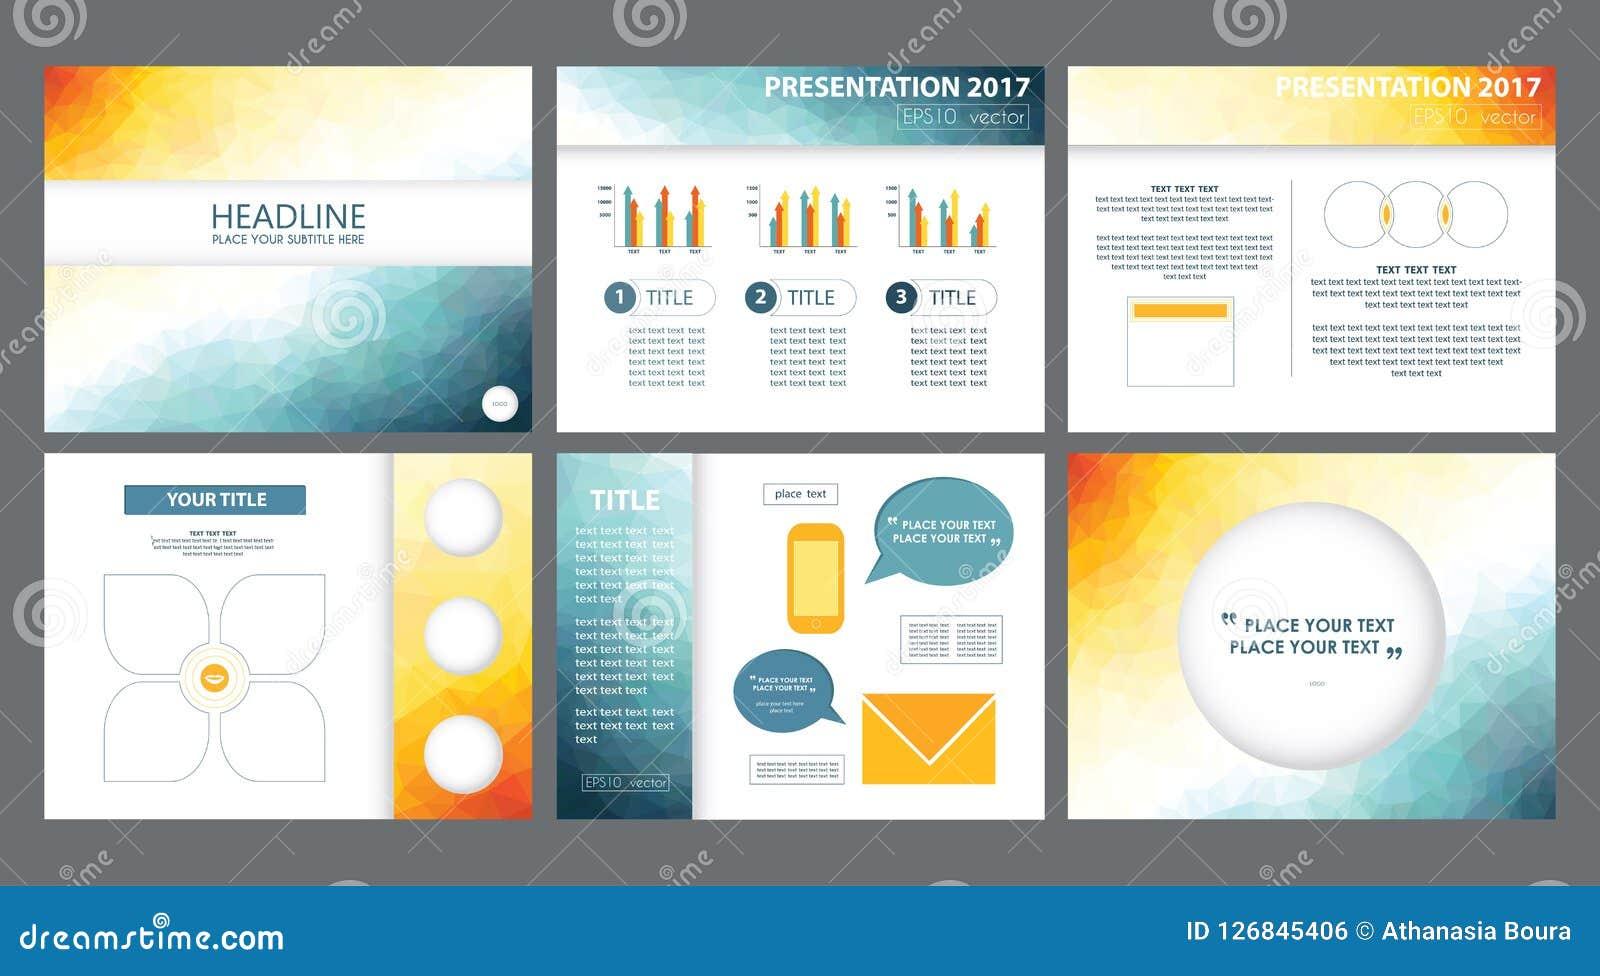 3d Yellow White Blue Powerpoint Presentation Templates